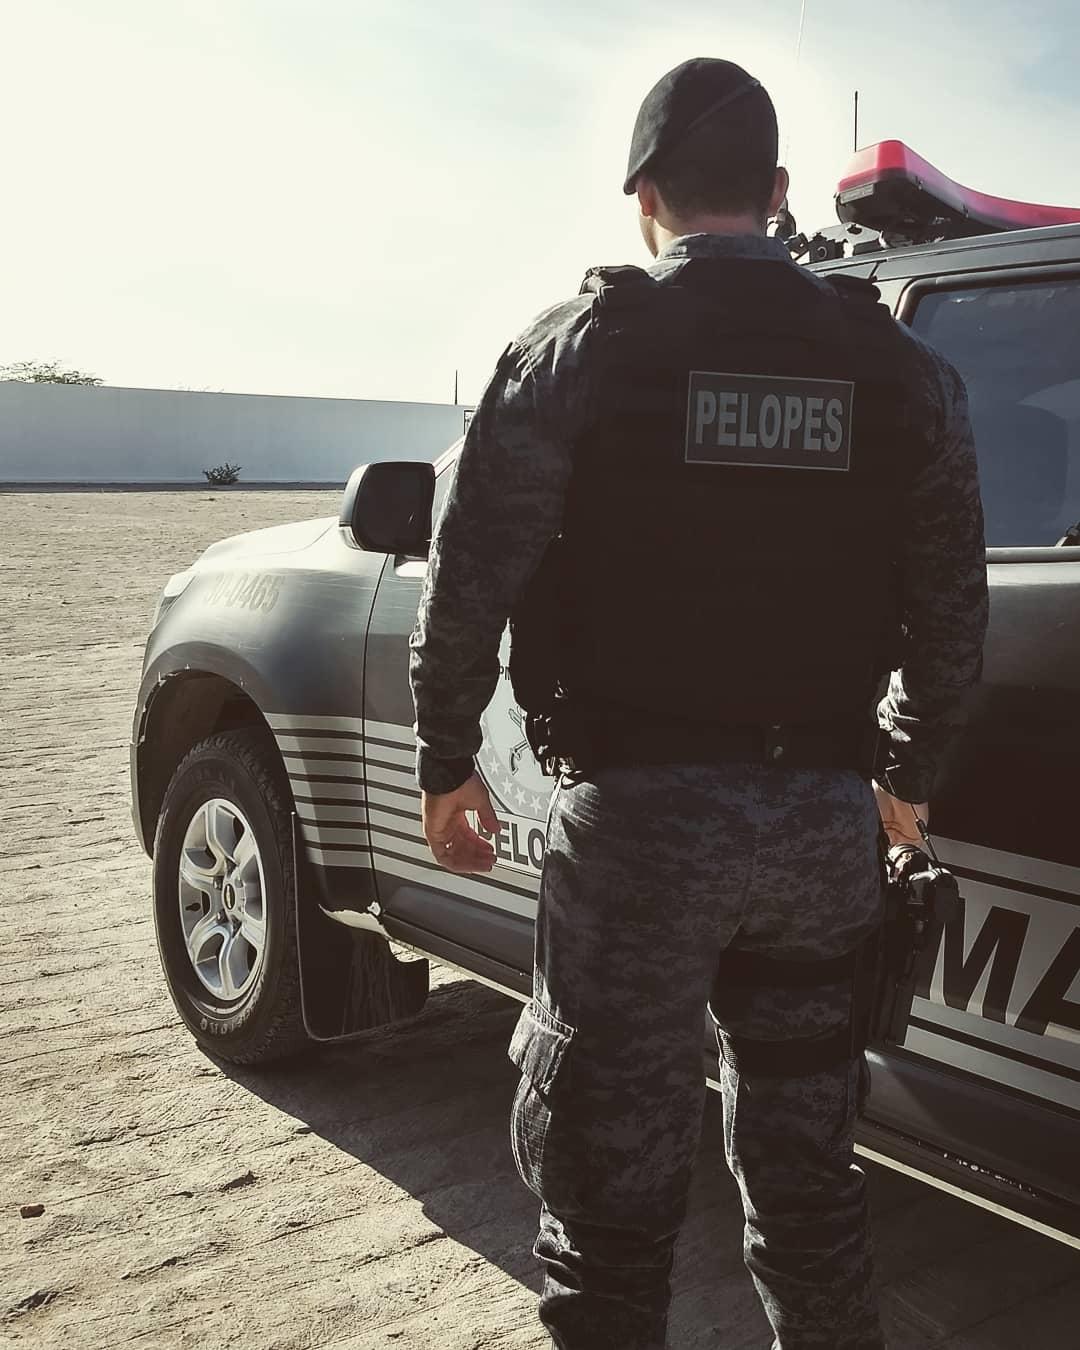 Policial de folga consegue frustrar tentativa de suicídio de jovem em Delmiro Gouveia